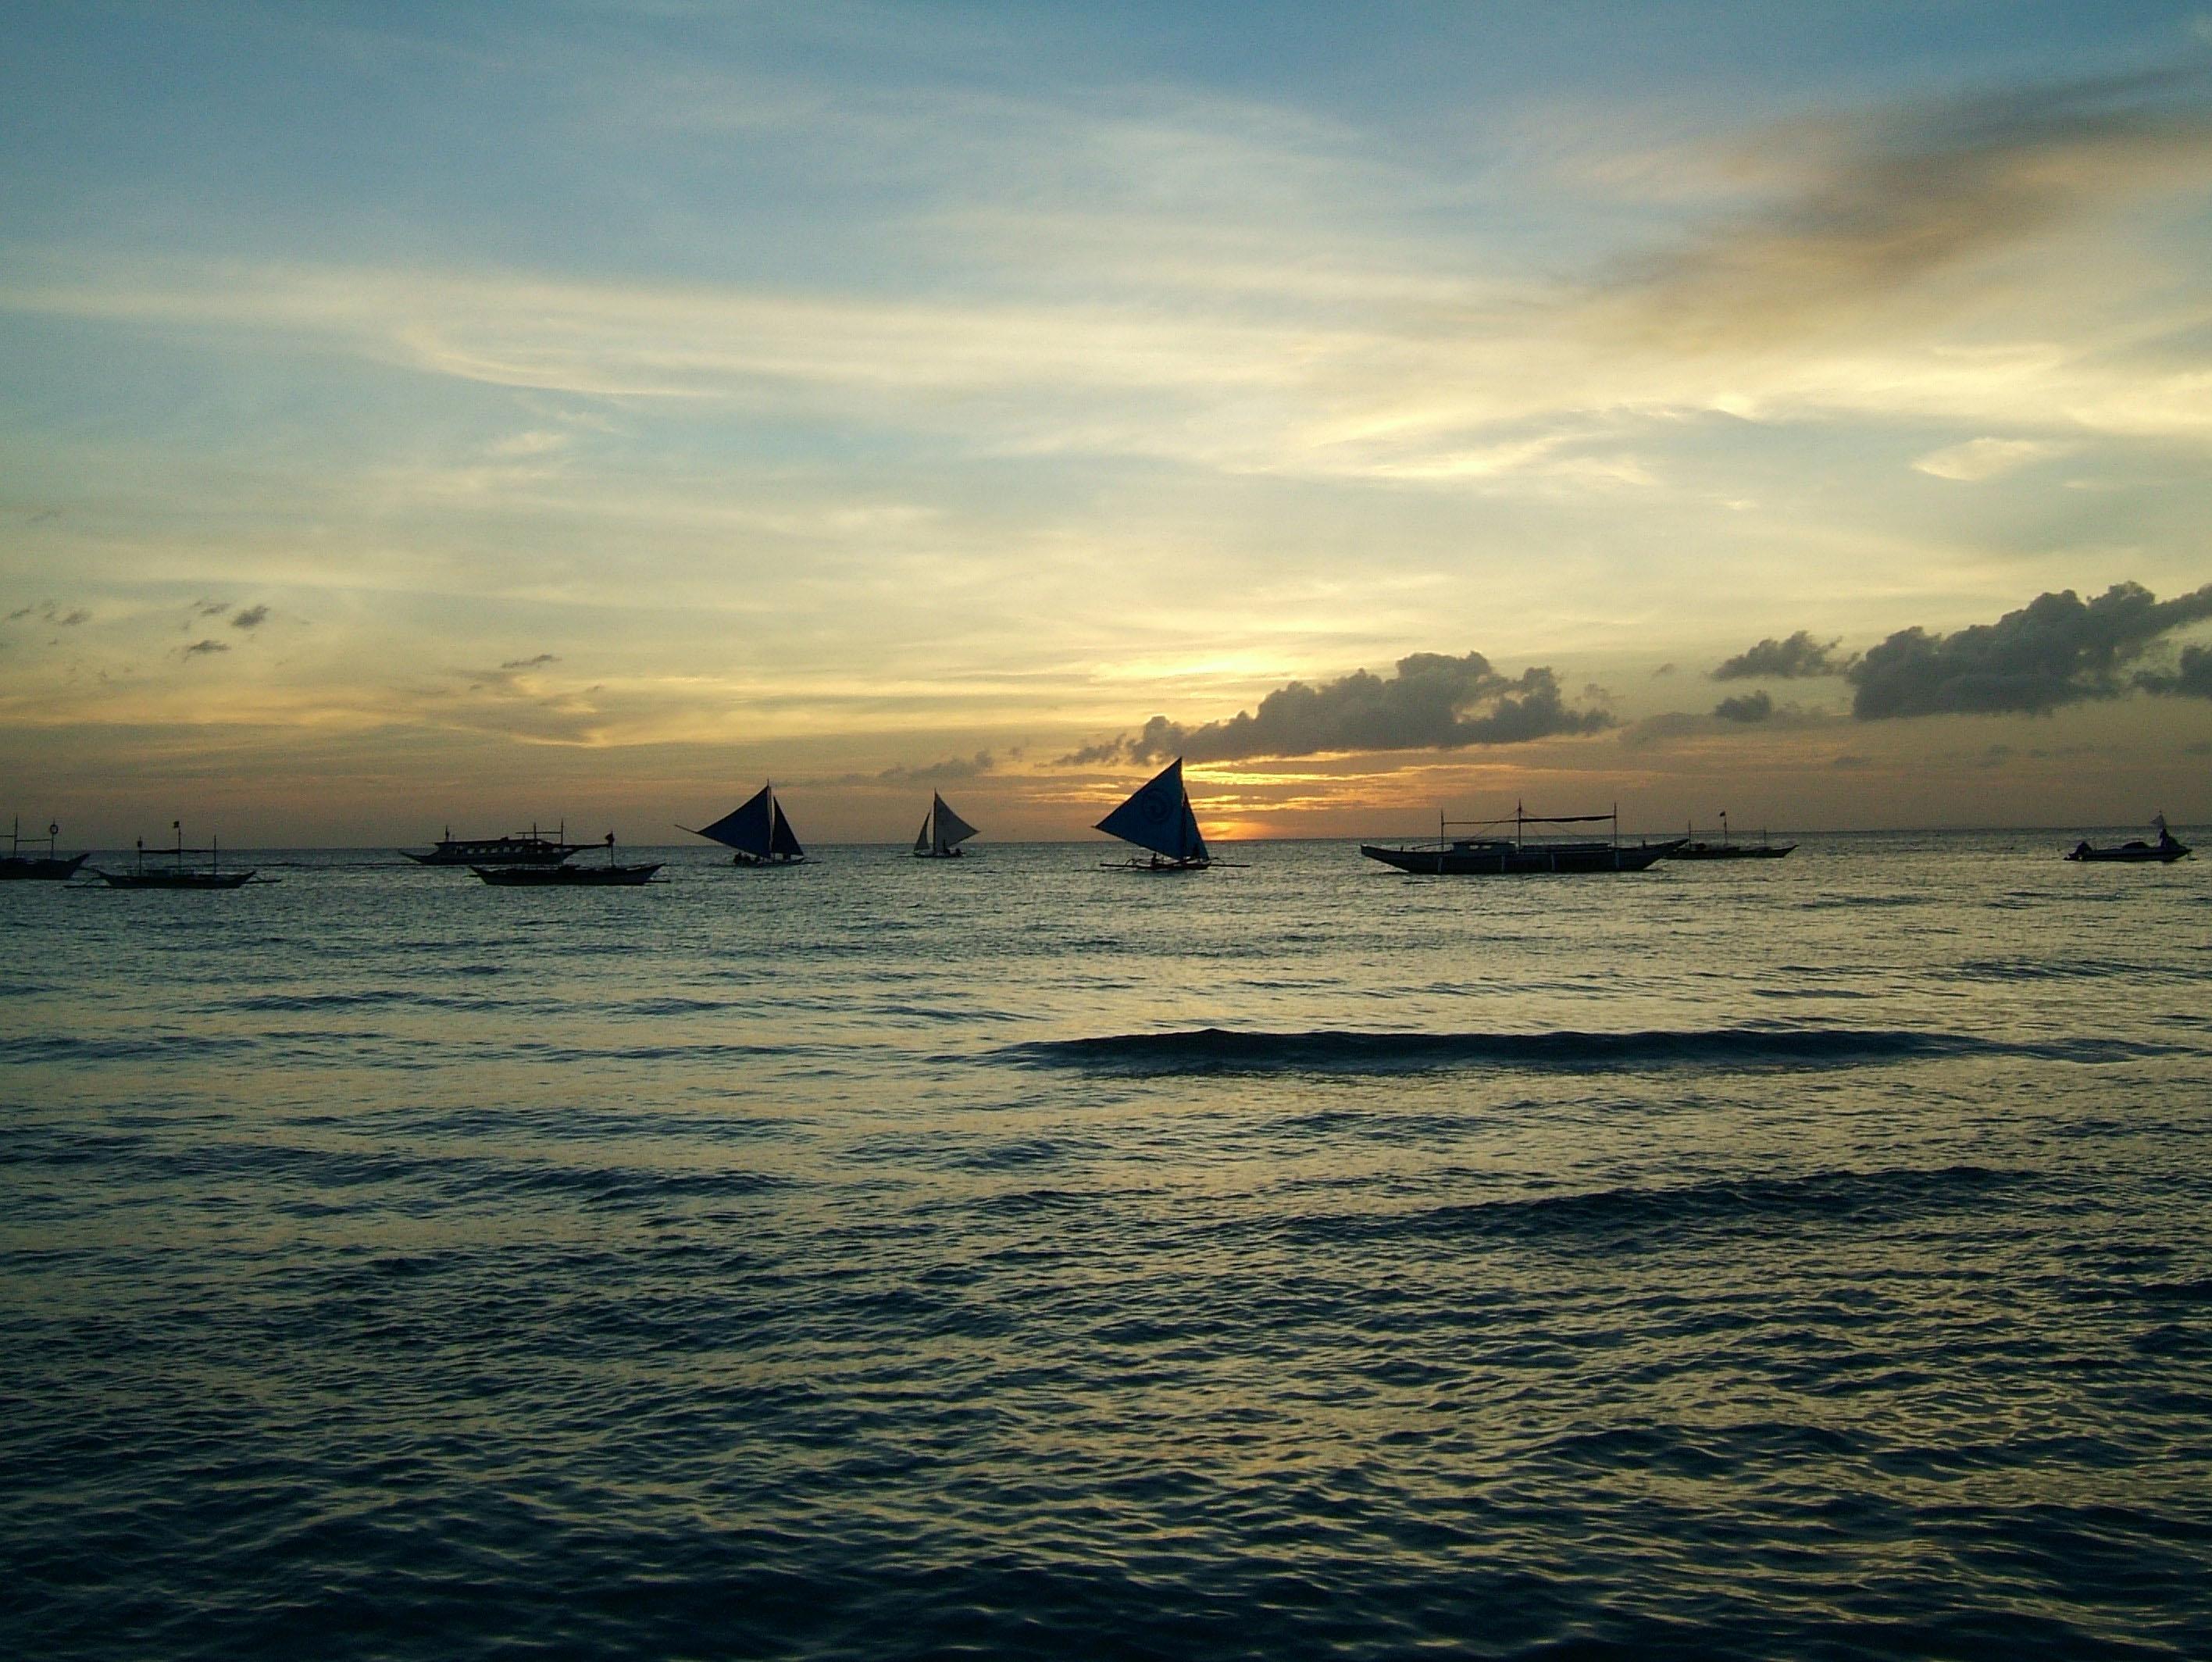 Sunset Philippines Boracay Beach 24